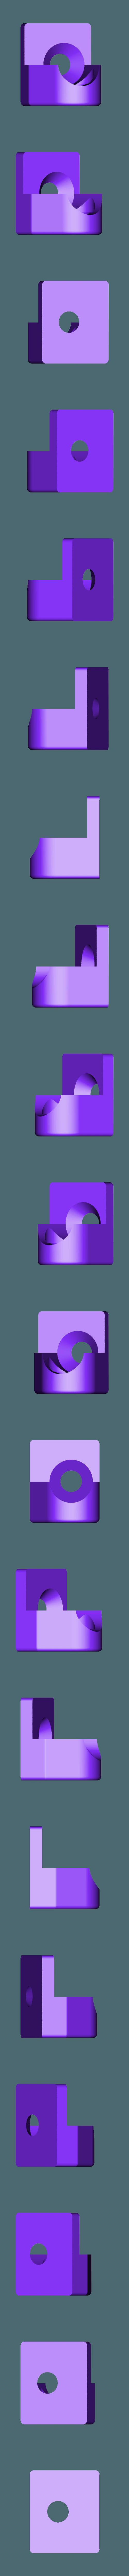 2020_Hinge_150_degree_v1-2.STL Download free STL file 2020 Hinge Corner • 3D printable design, WalterHsiao